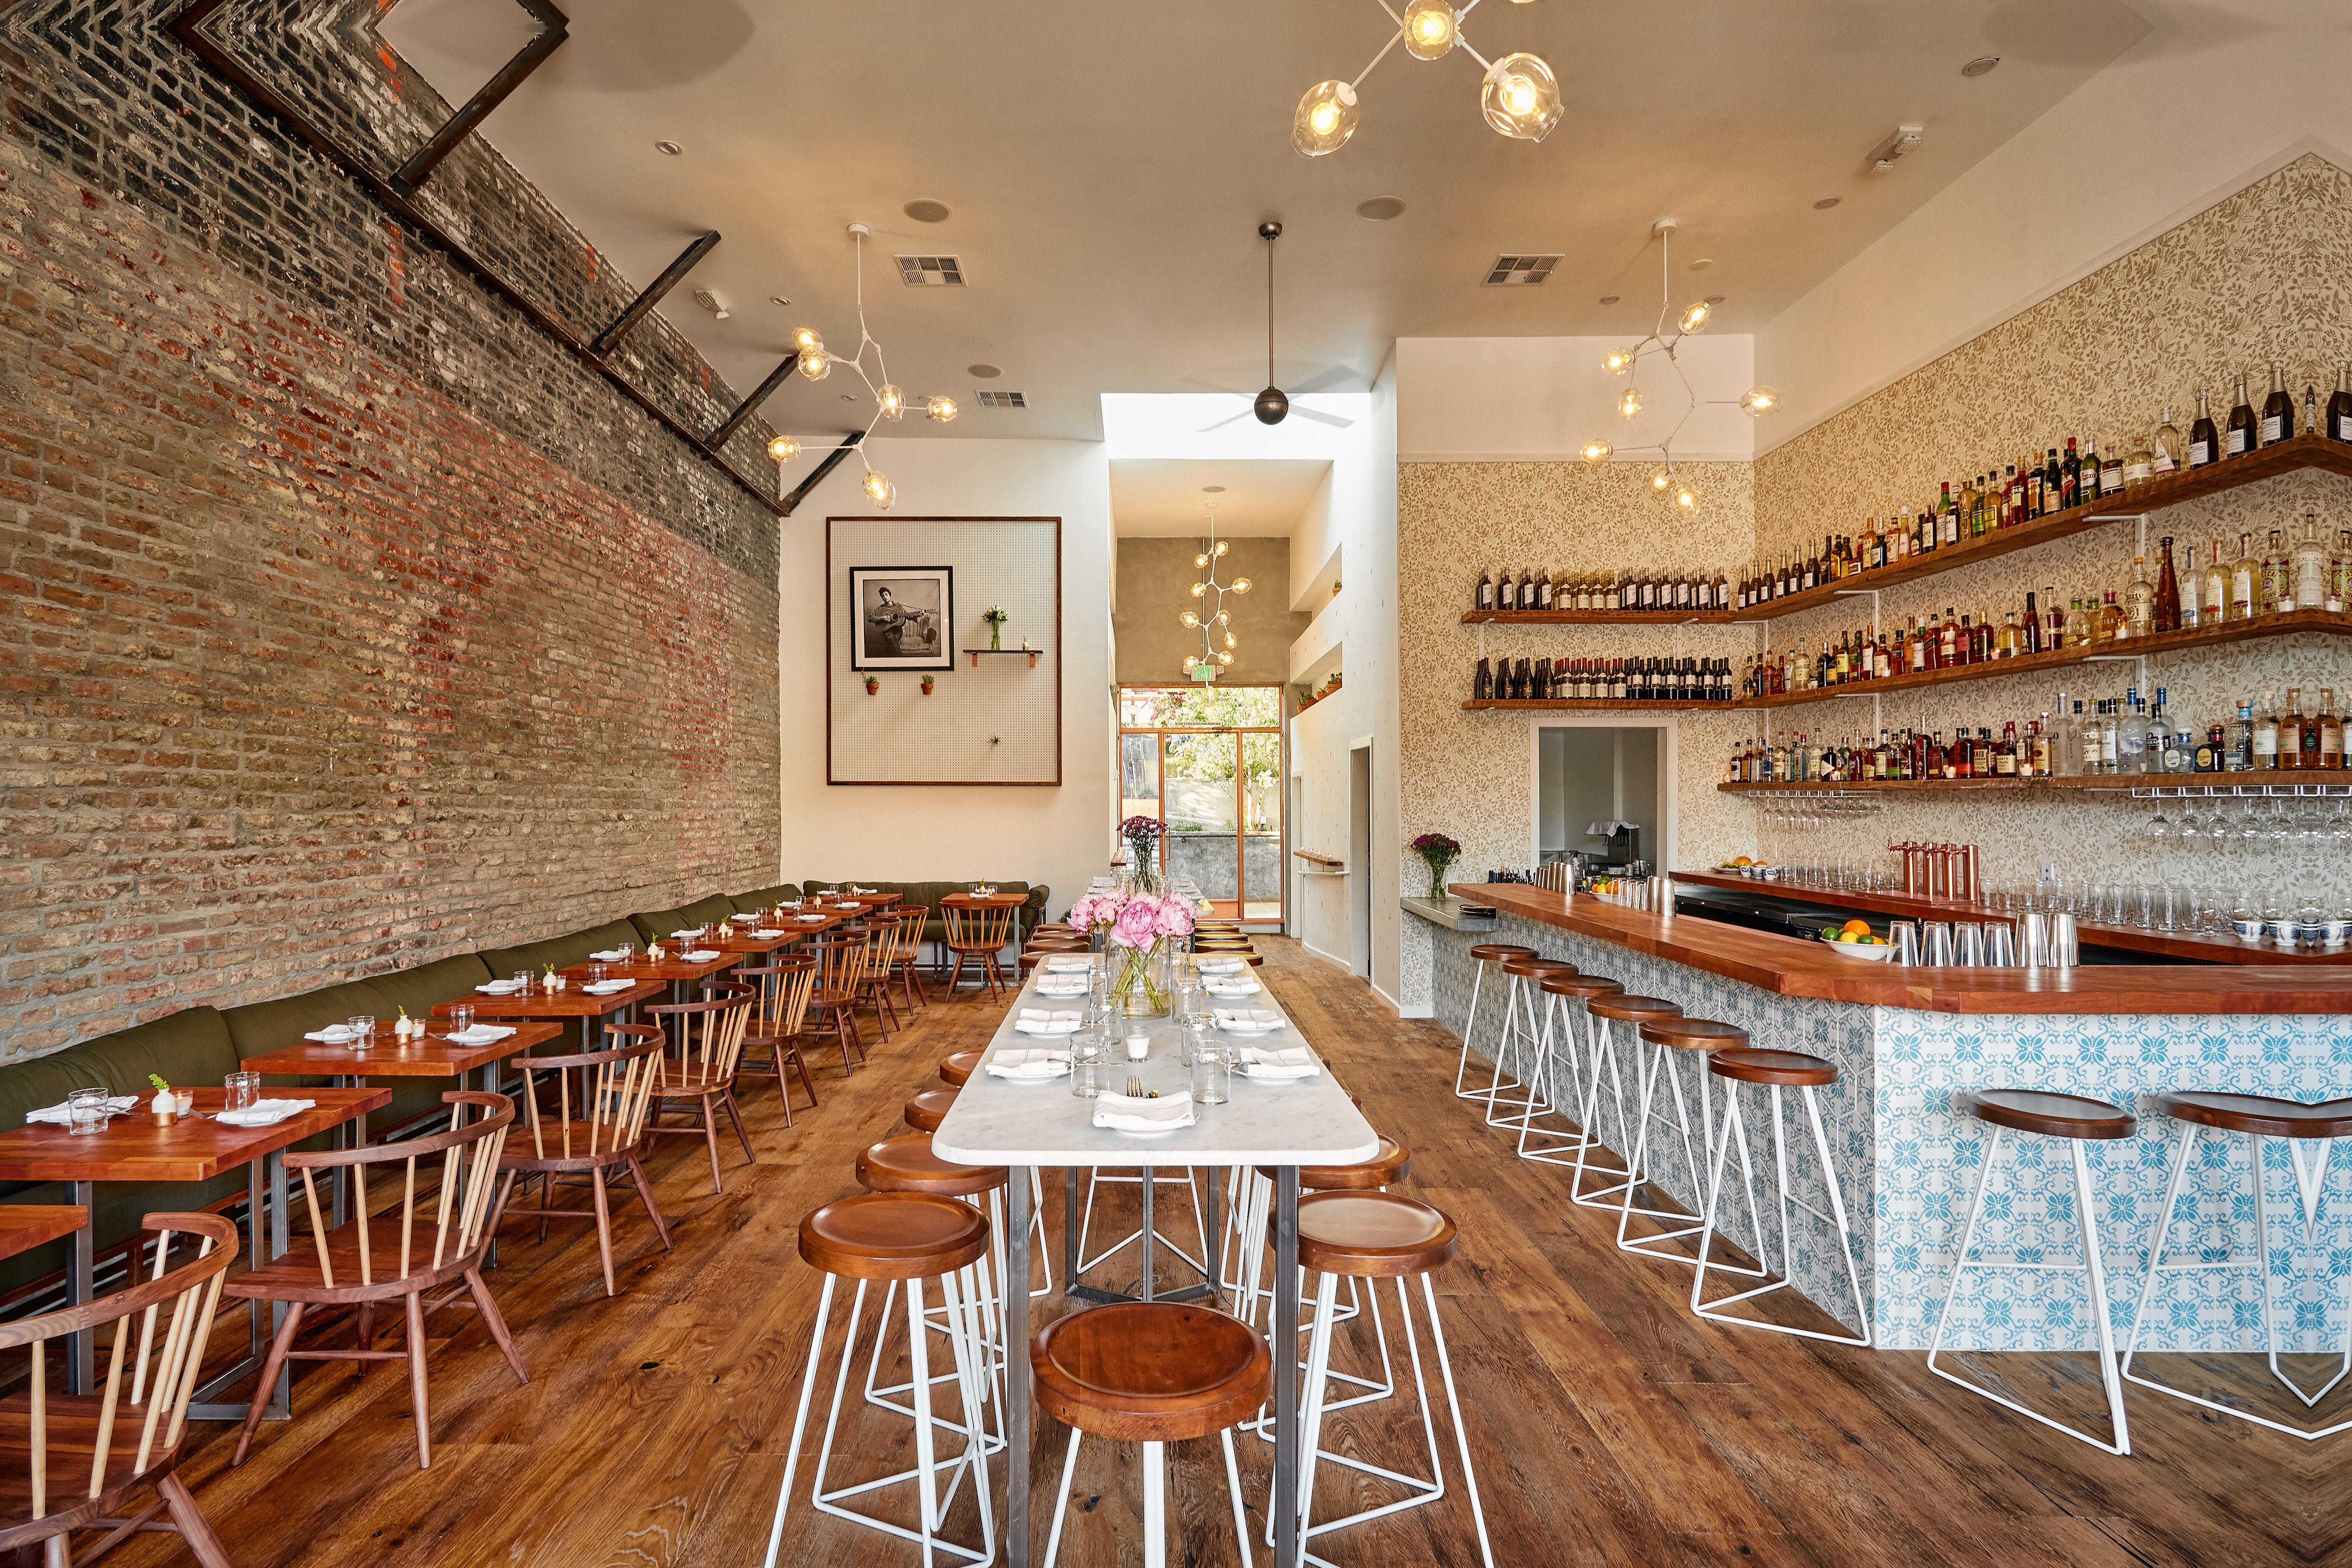 seafood intensive sawyer kitchen bar hits silver lake huffpost